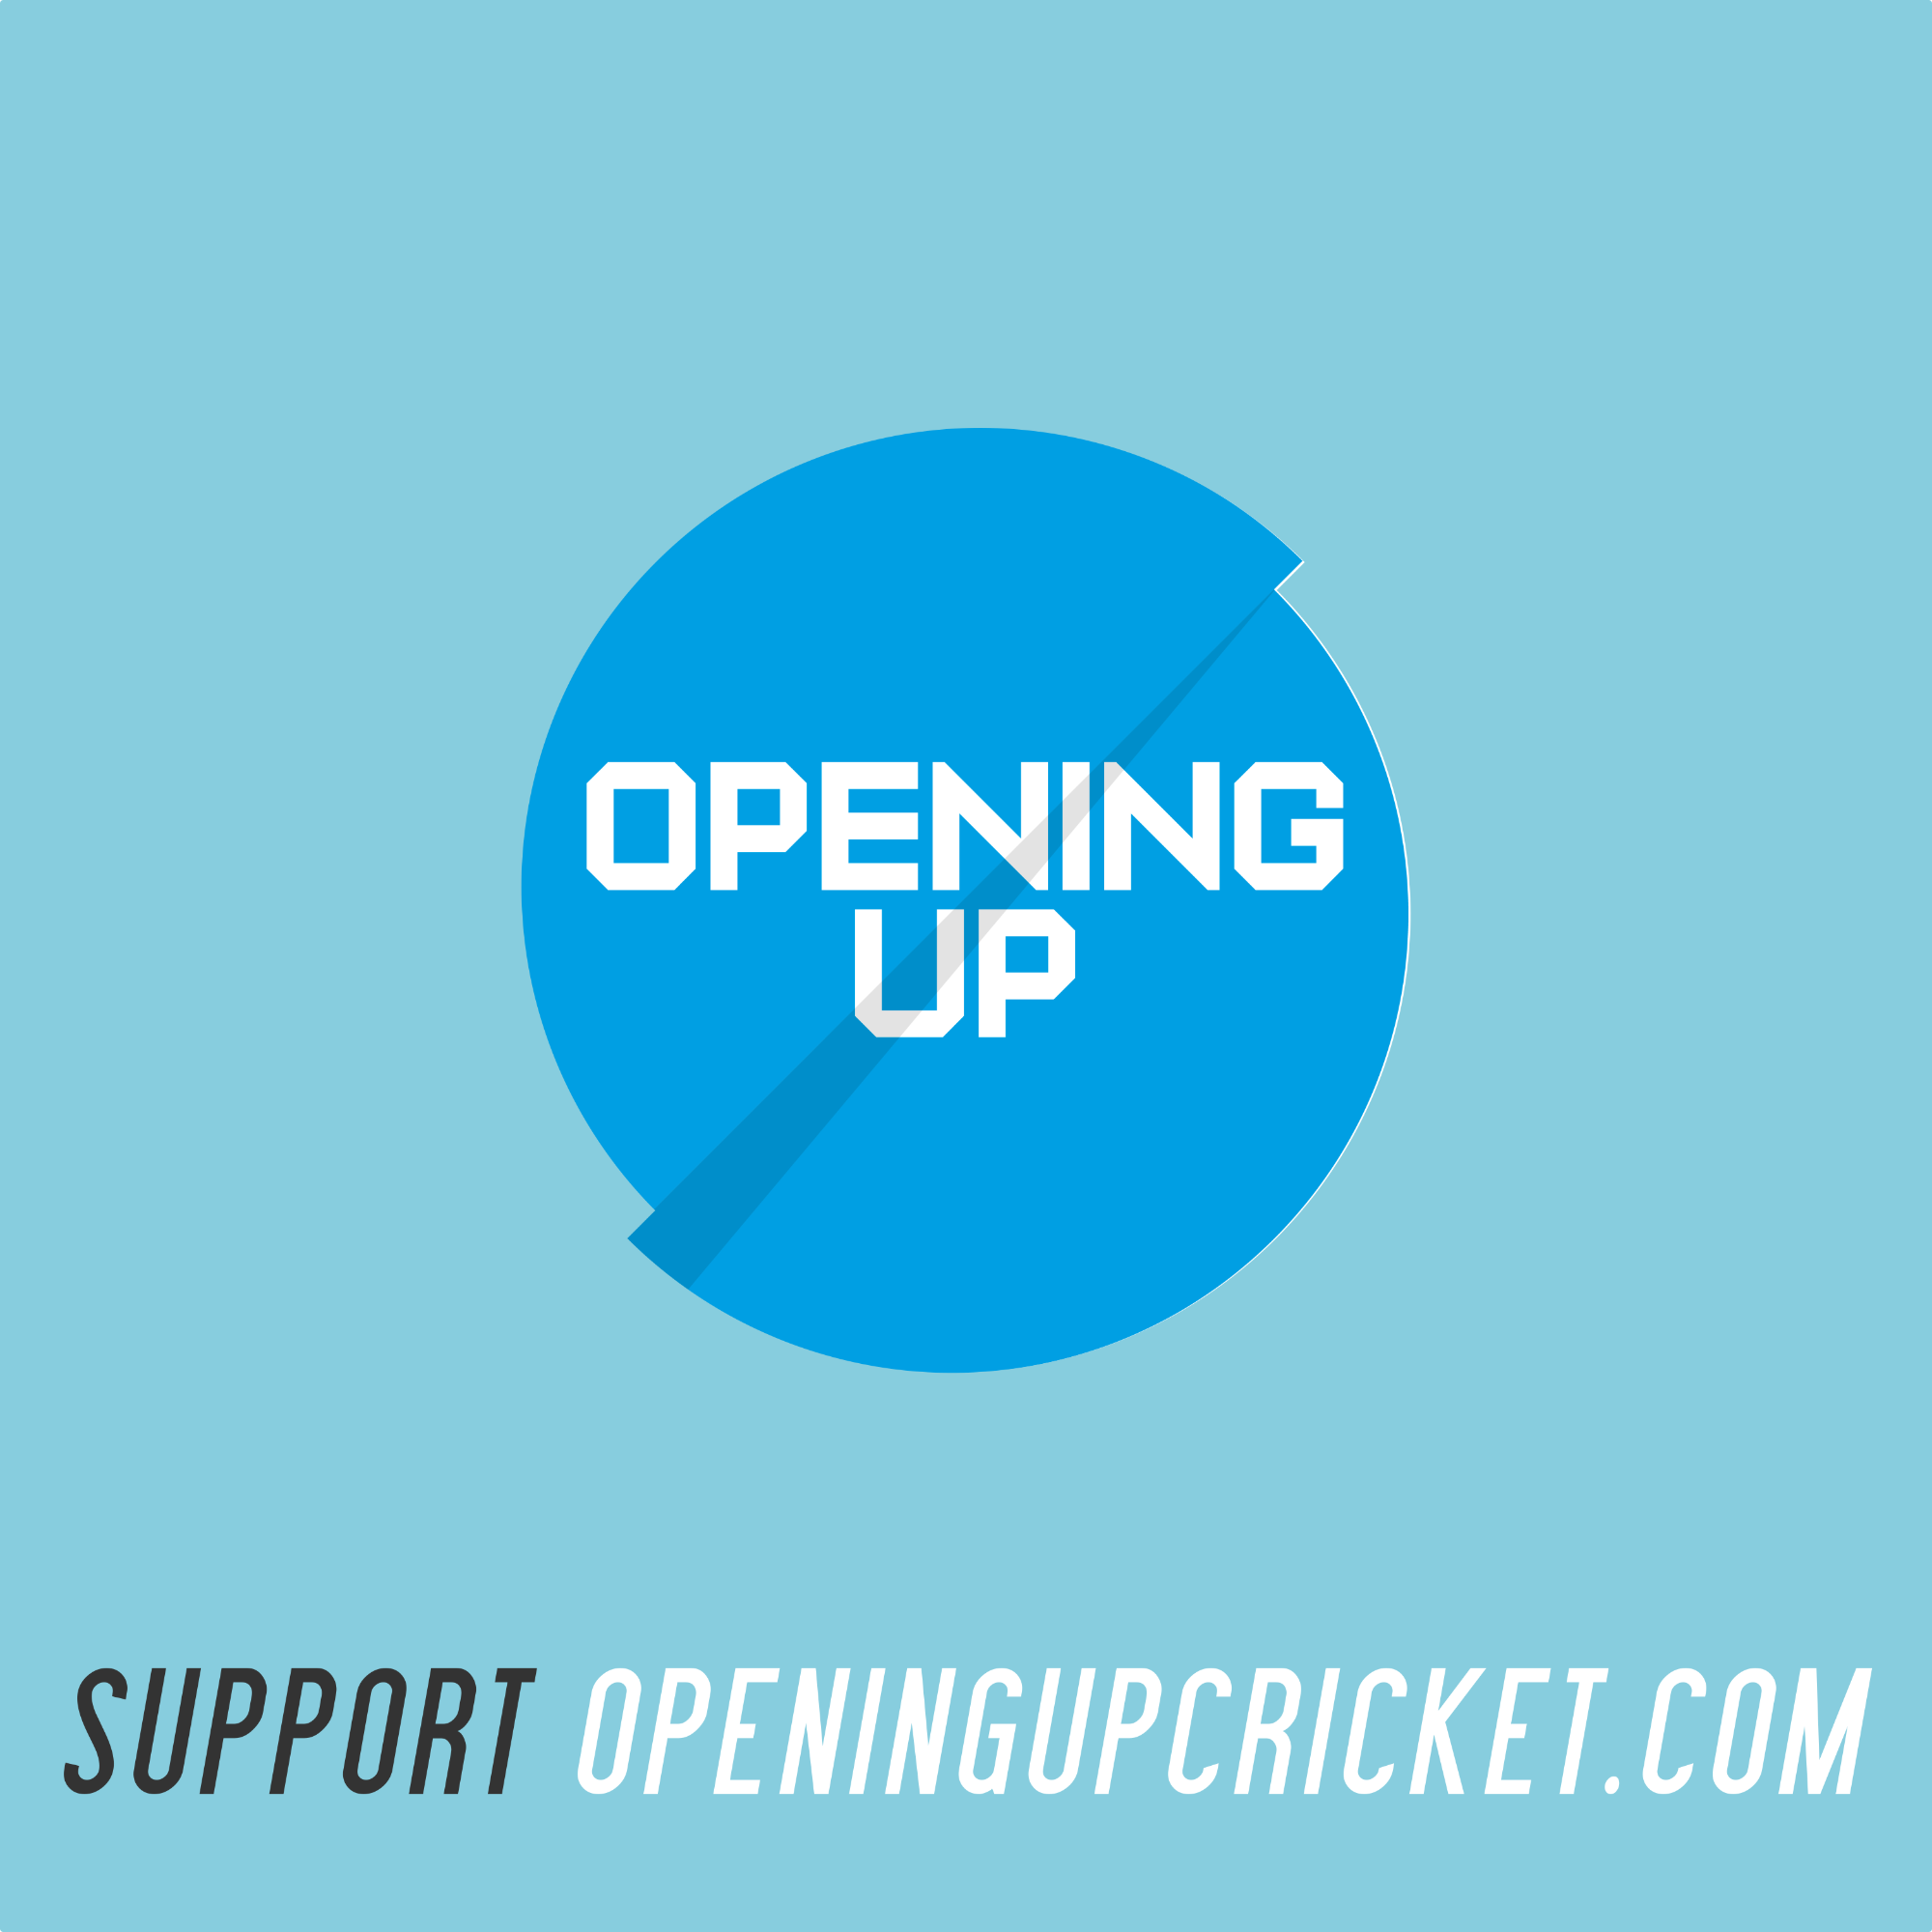 Cricket Mental Health Charity